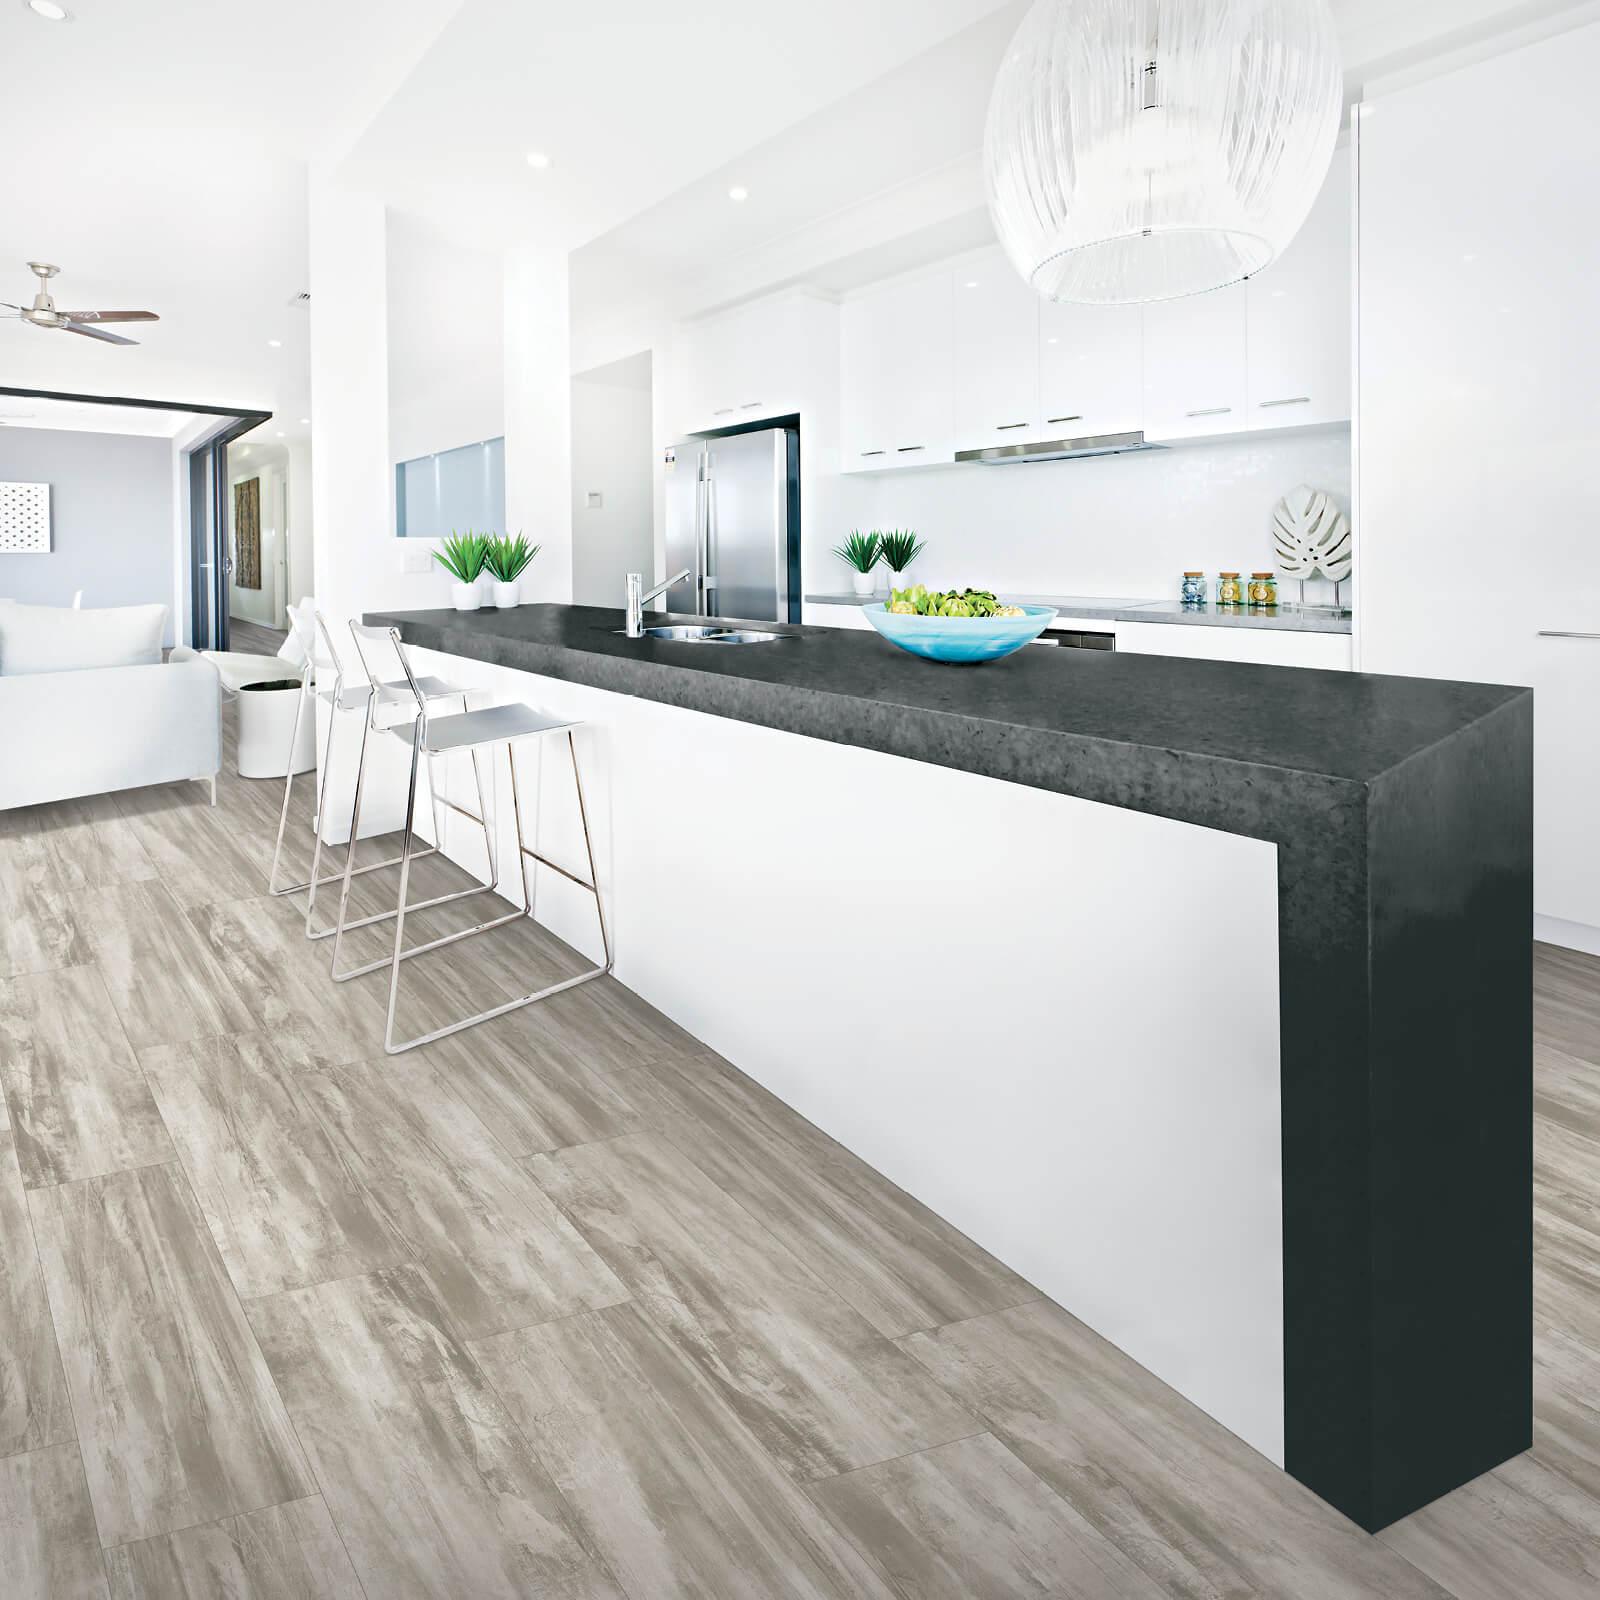 Laminate Flooring | Wacky's Flooring